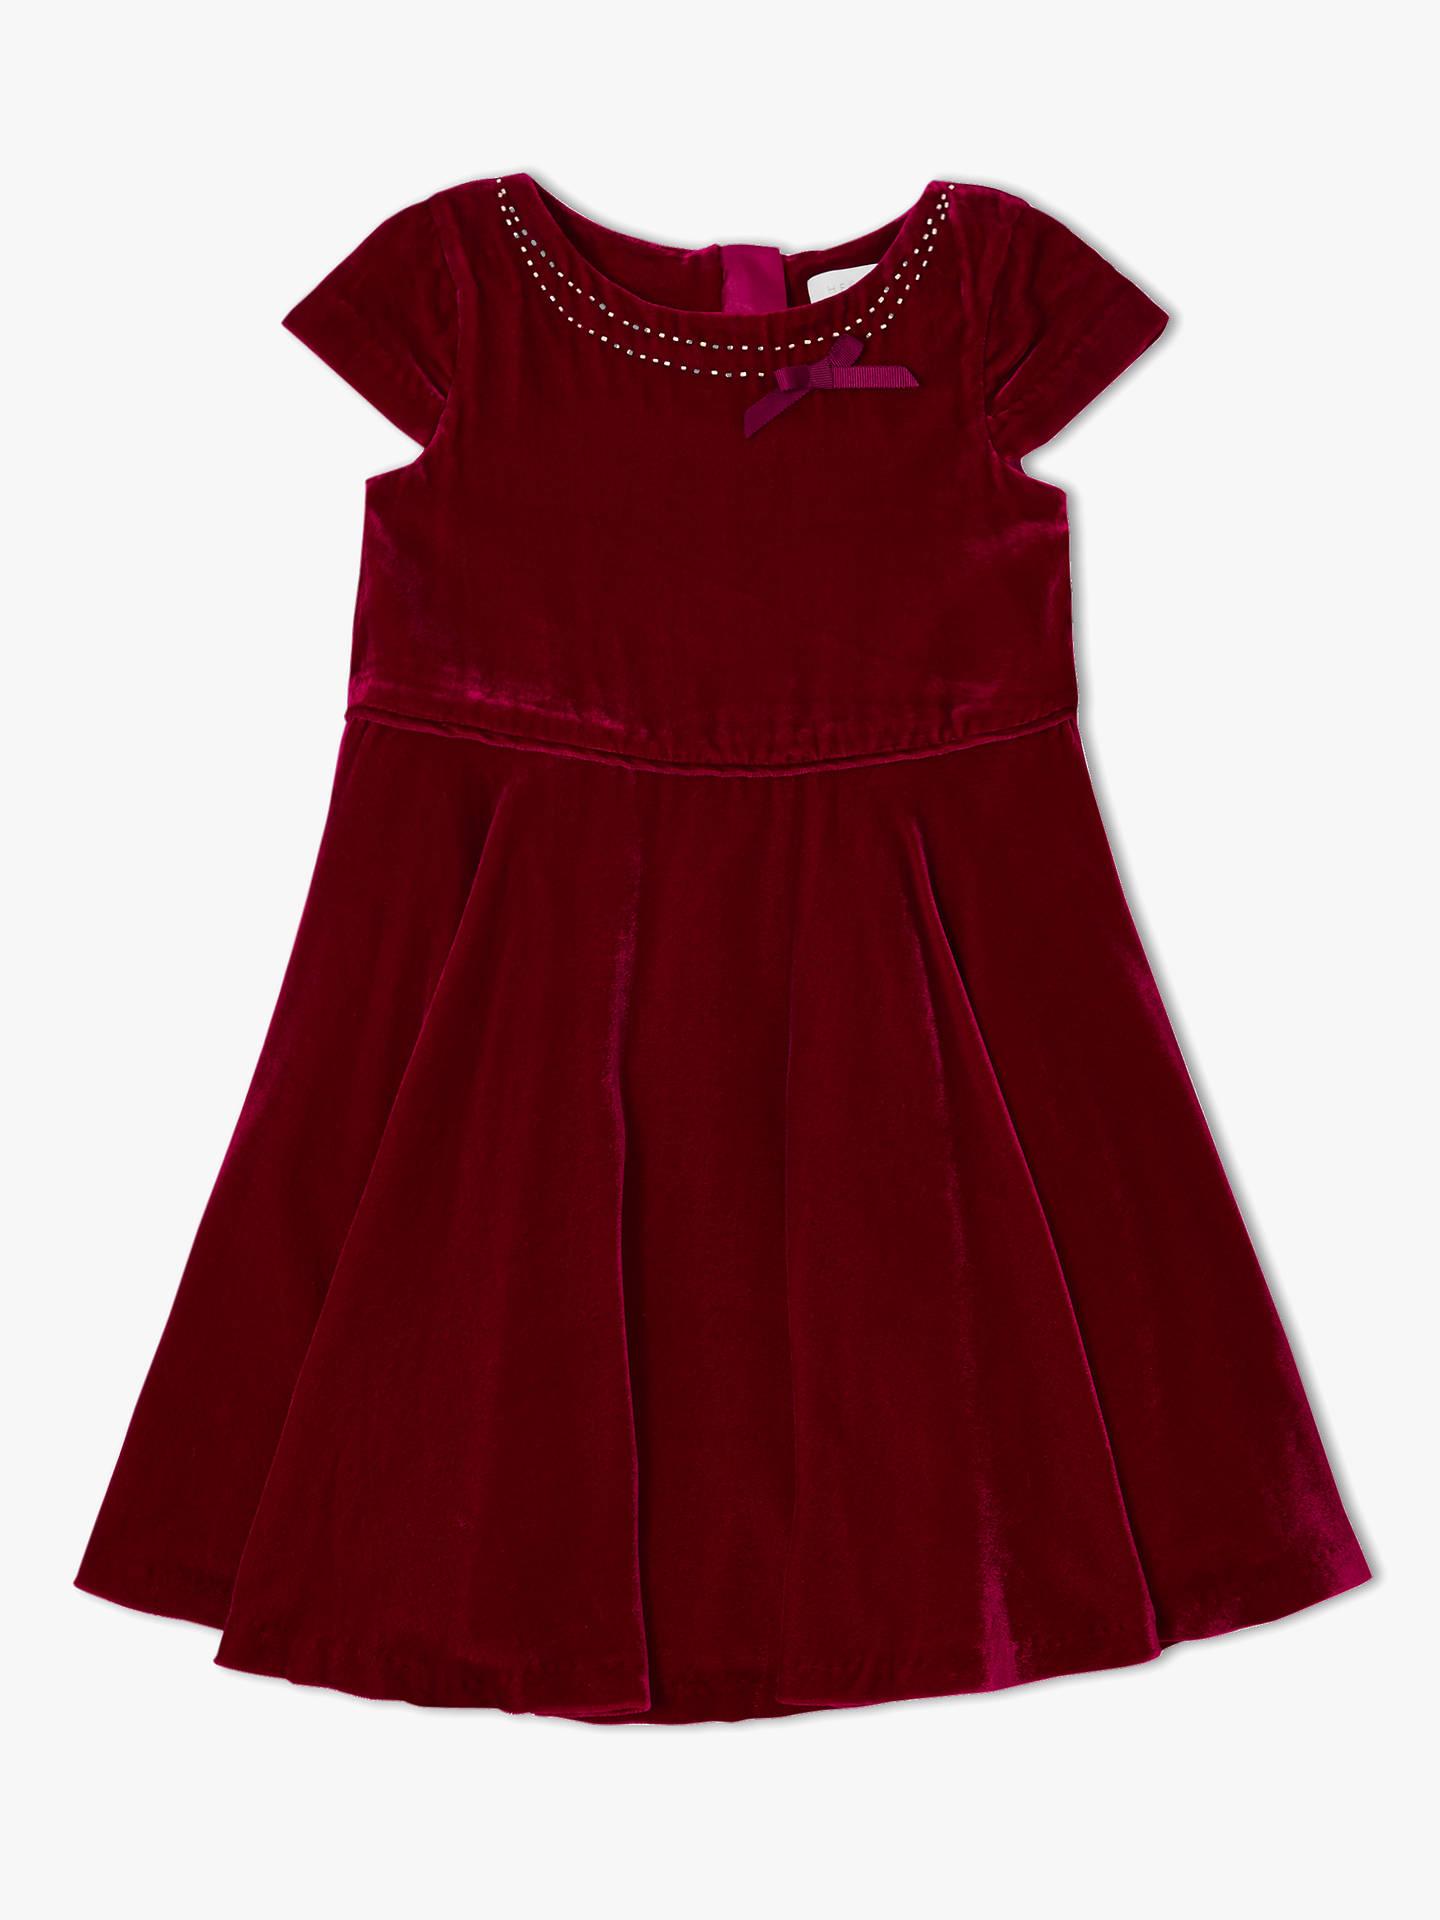 efca3c9b2b3 Buy John Lewis   Partners Heirloom Collection Velvet Dress